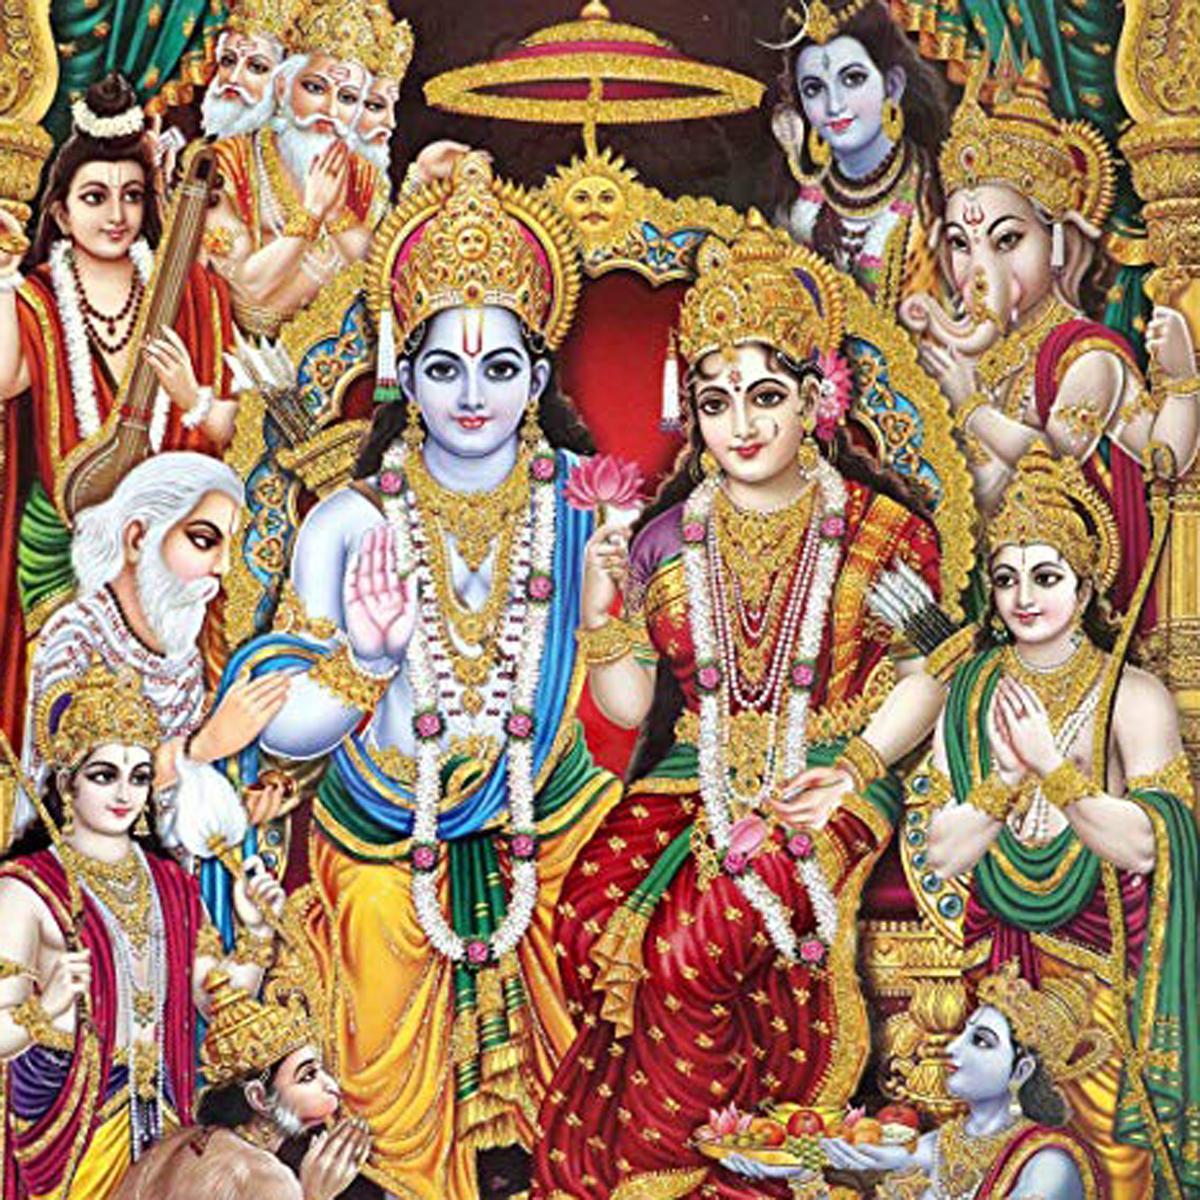 Happy Ram Navami 2021 শুভ রাম নবমী